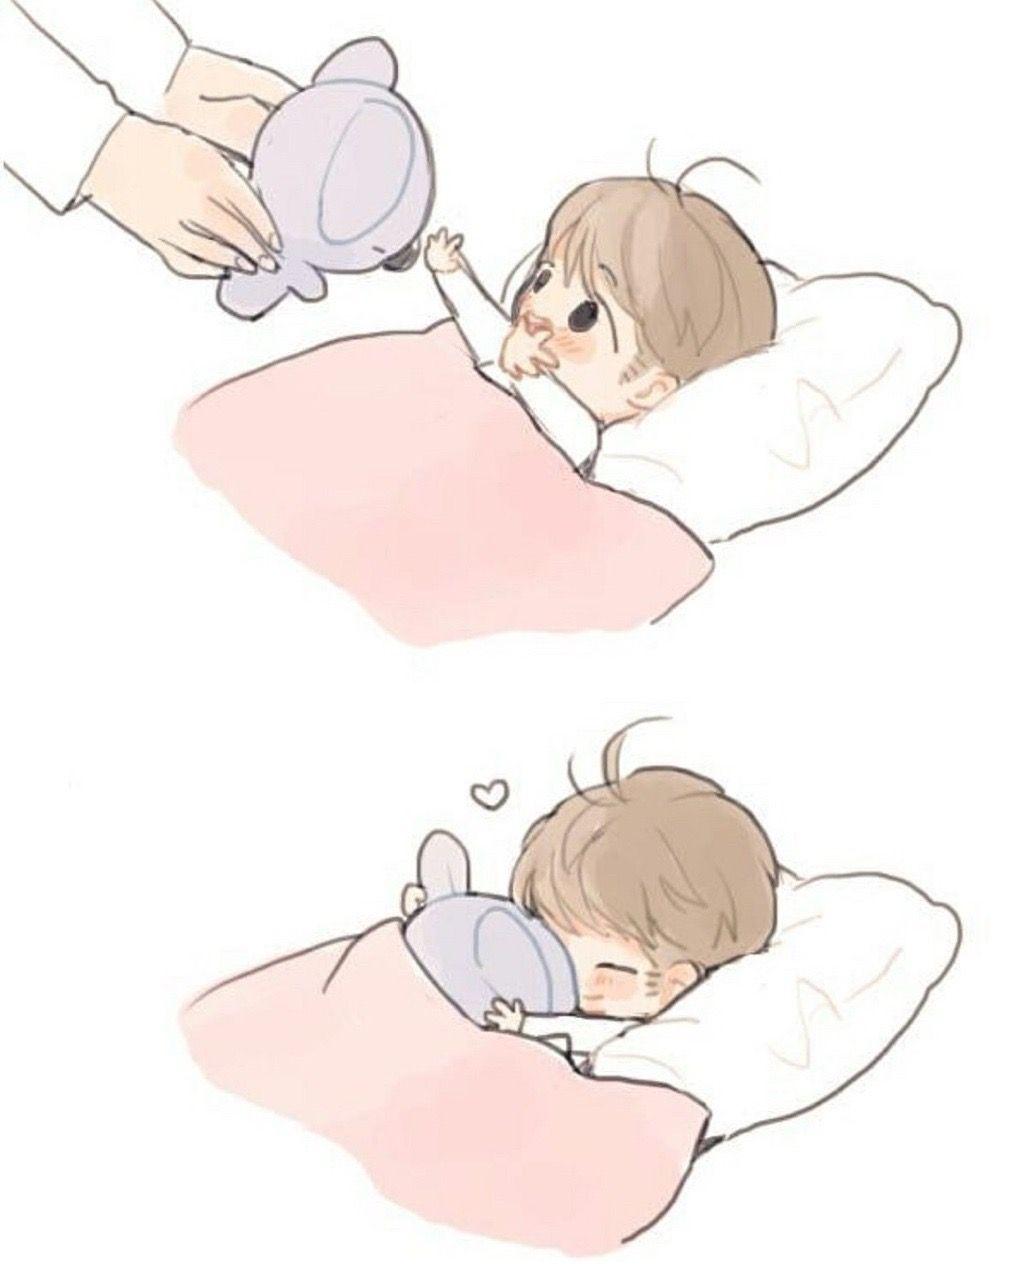 Pin By Ronnie Lynn On Kawaii In 2020 Anime Baby Anime Child Anime Family